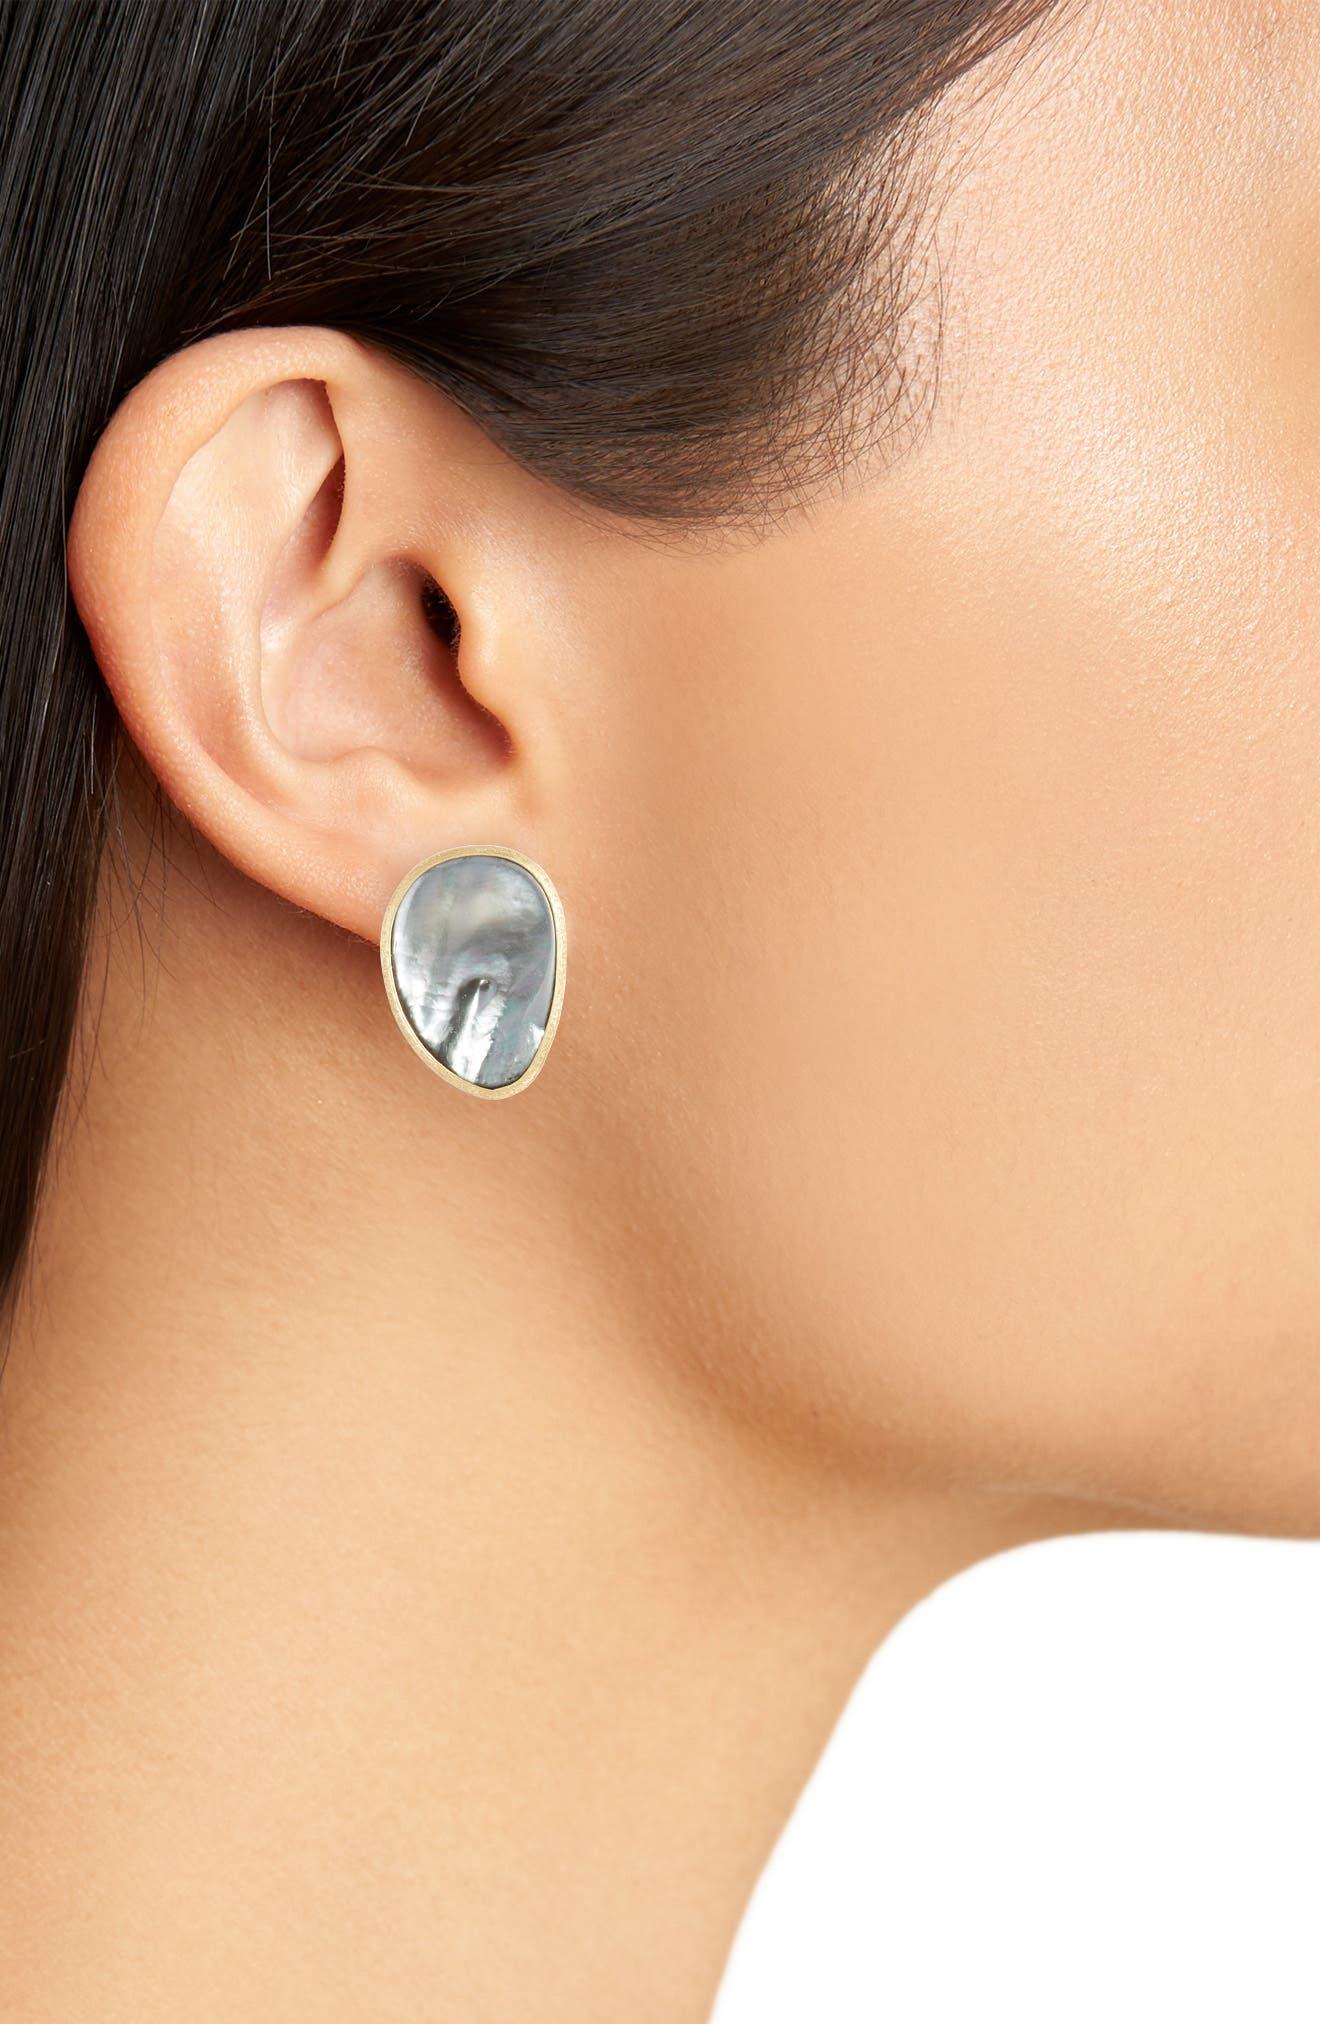 Lunaria Pearl Stud Earrings,                             Alternate thumbnail 2, color,                             GREY MOTHER OF PEARL